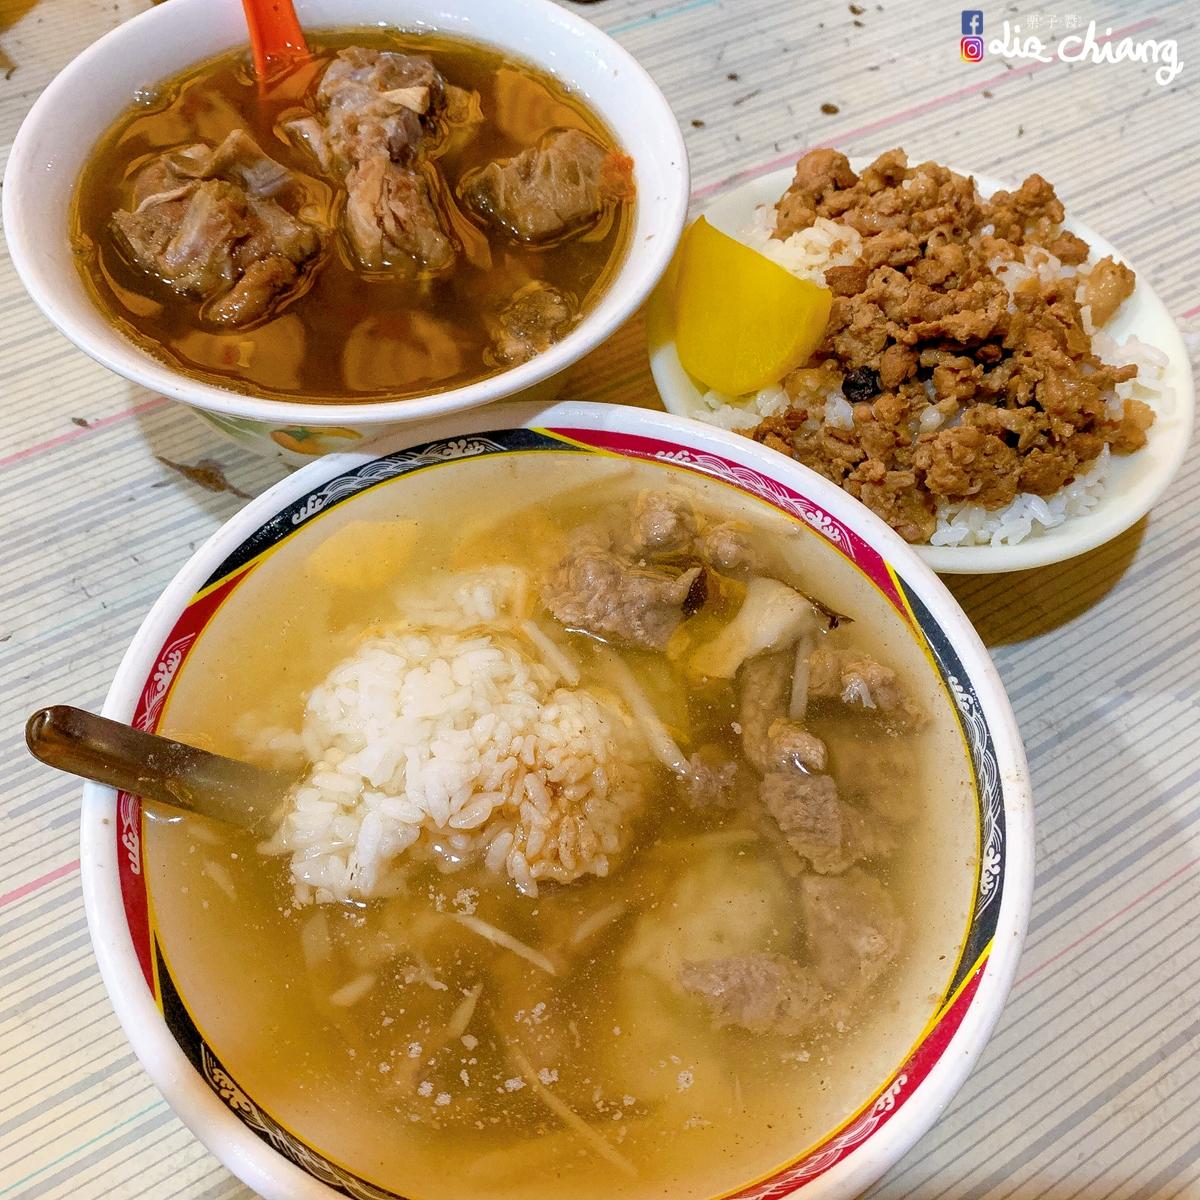 IMG_0204Liz chiang 栗子醬-美食部落客-料理部落客